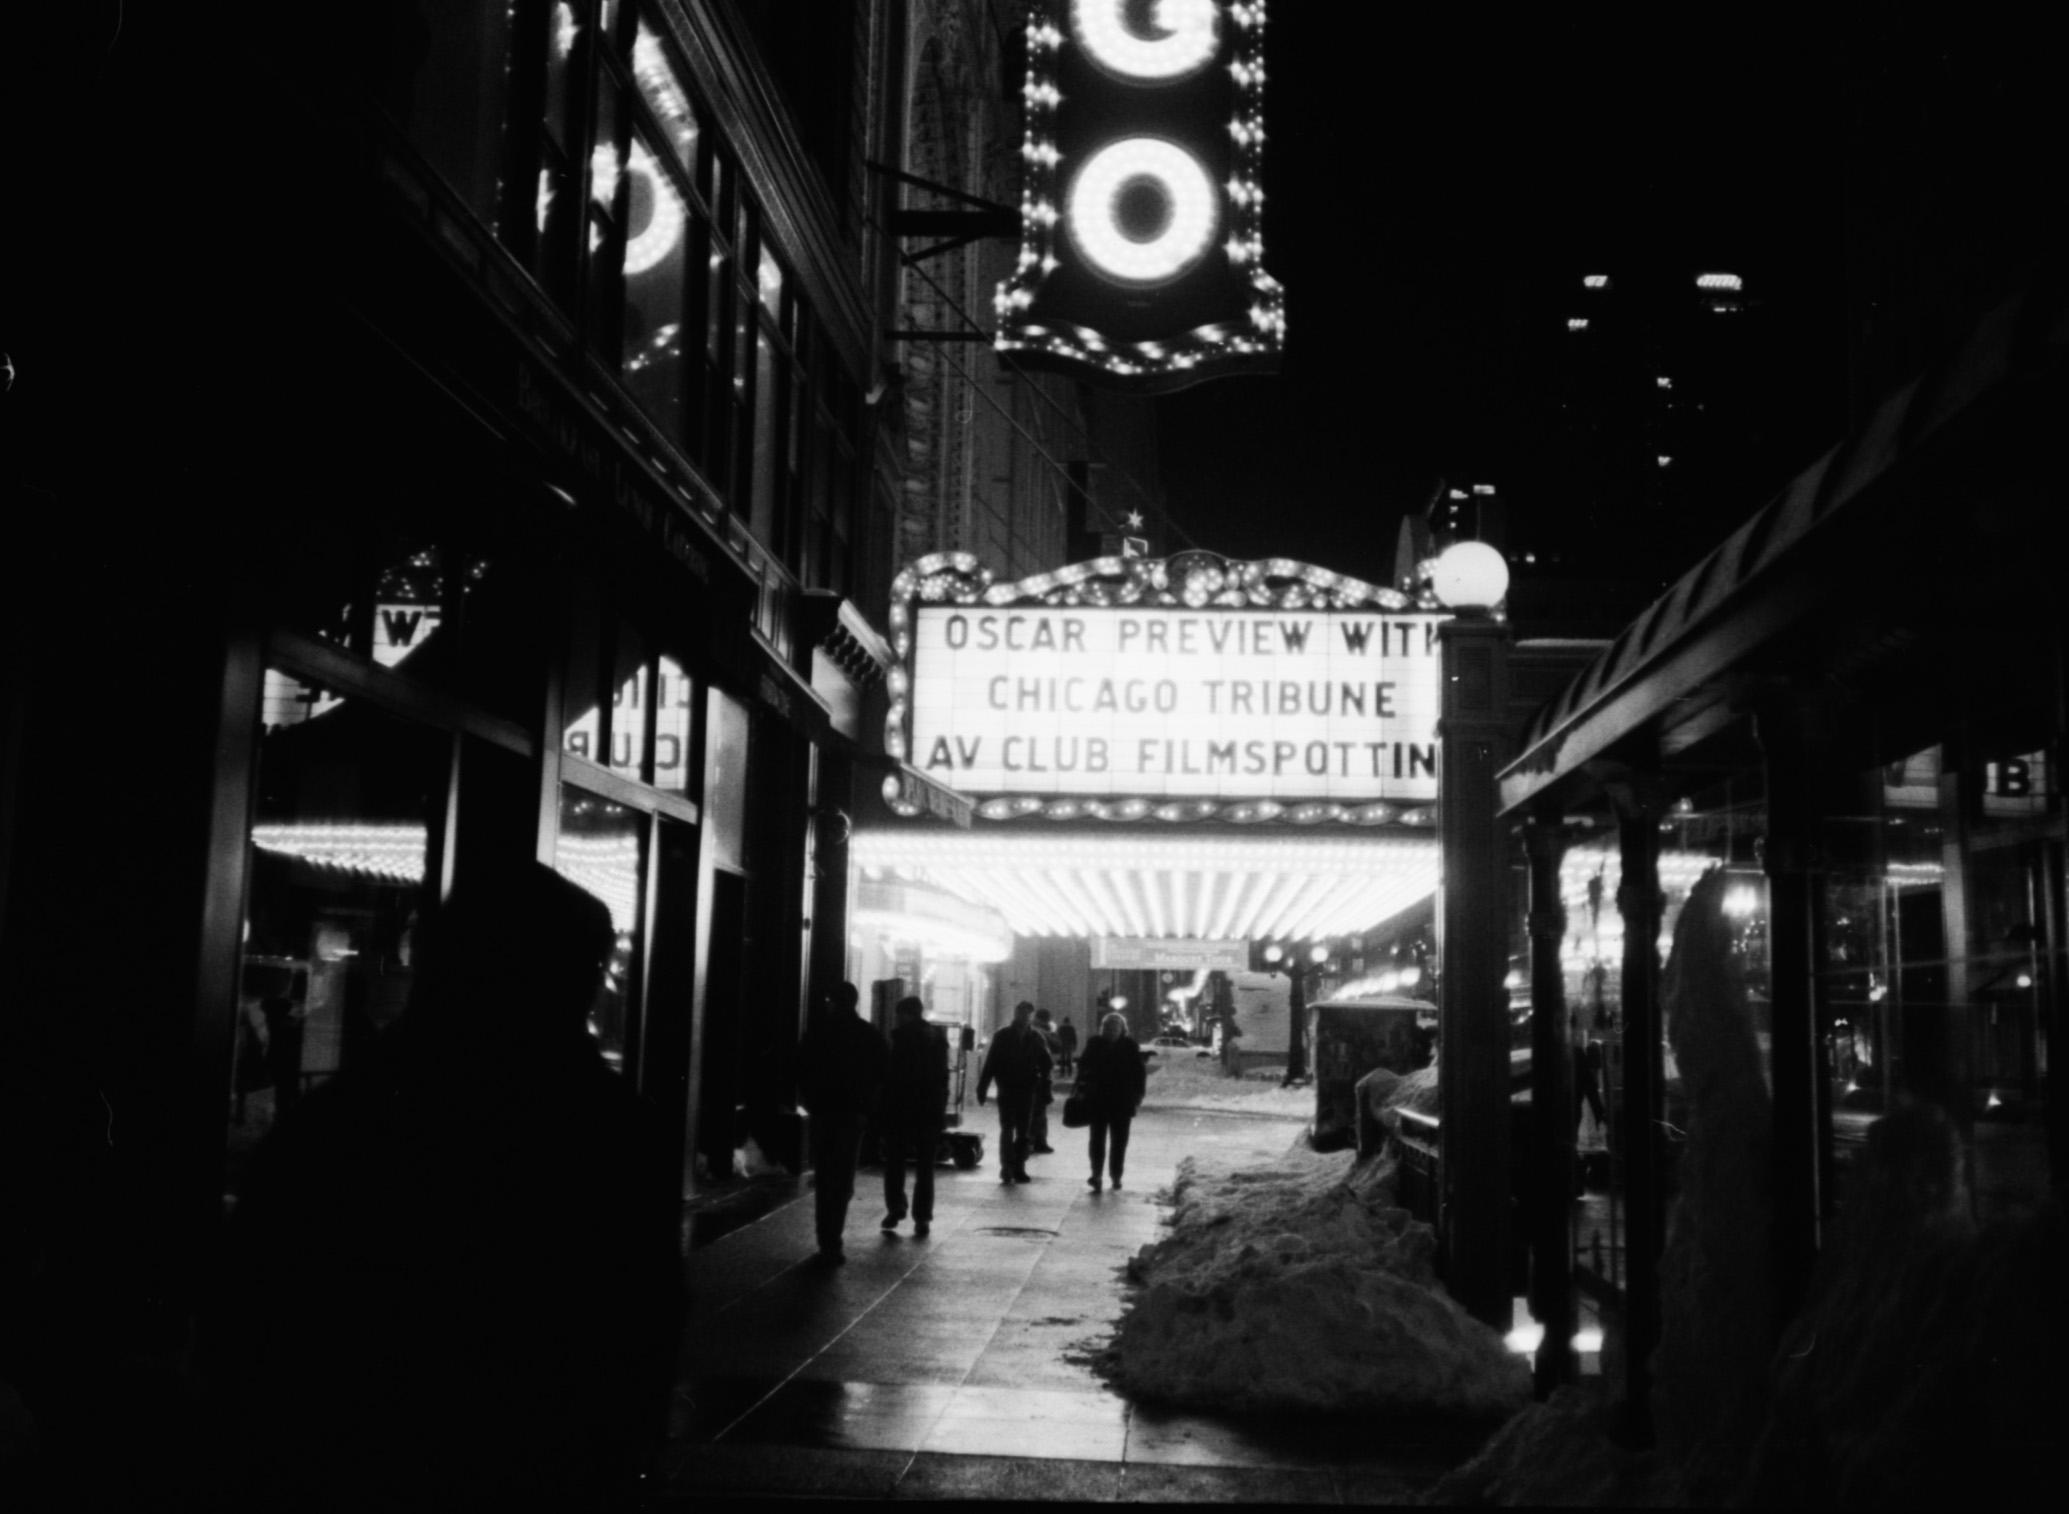 filmspotting, chicago theatre